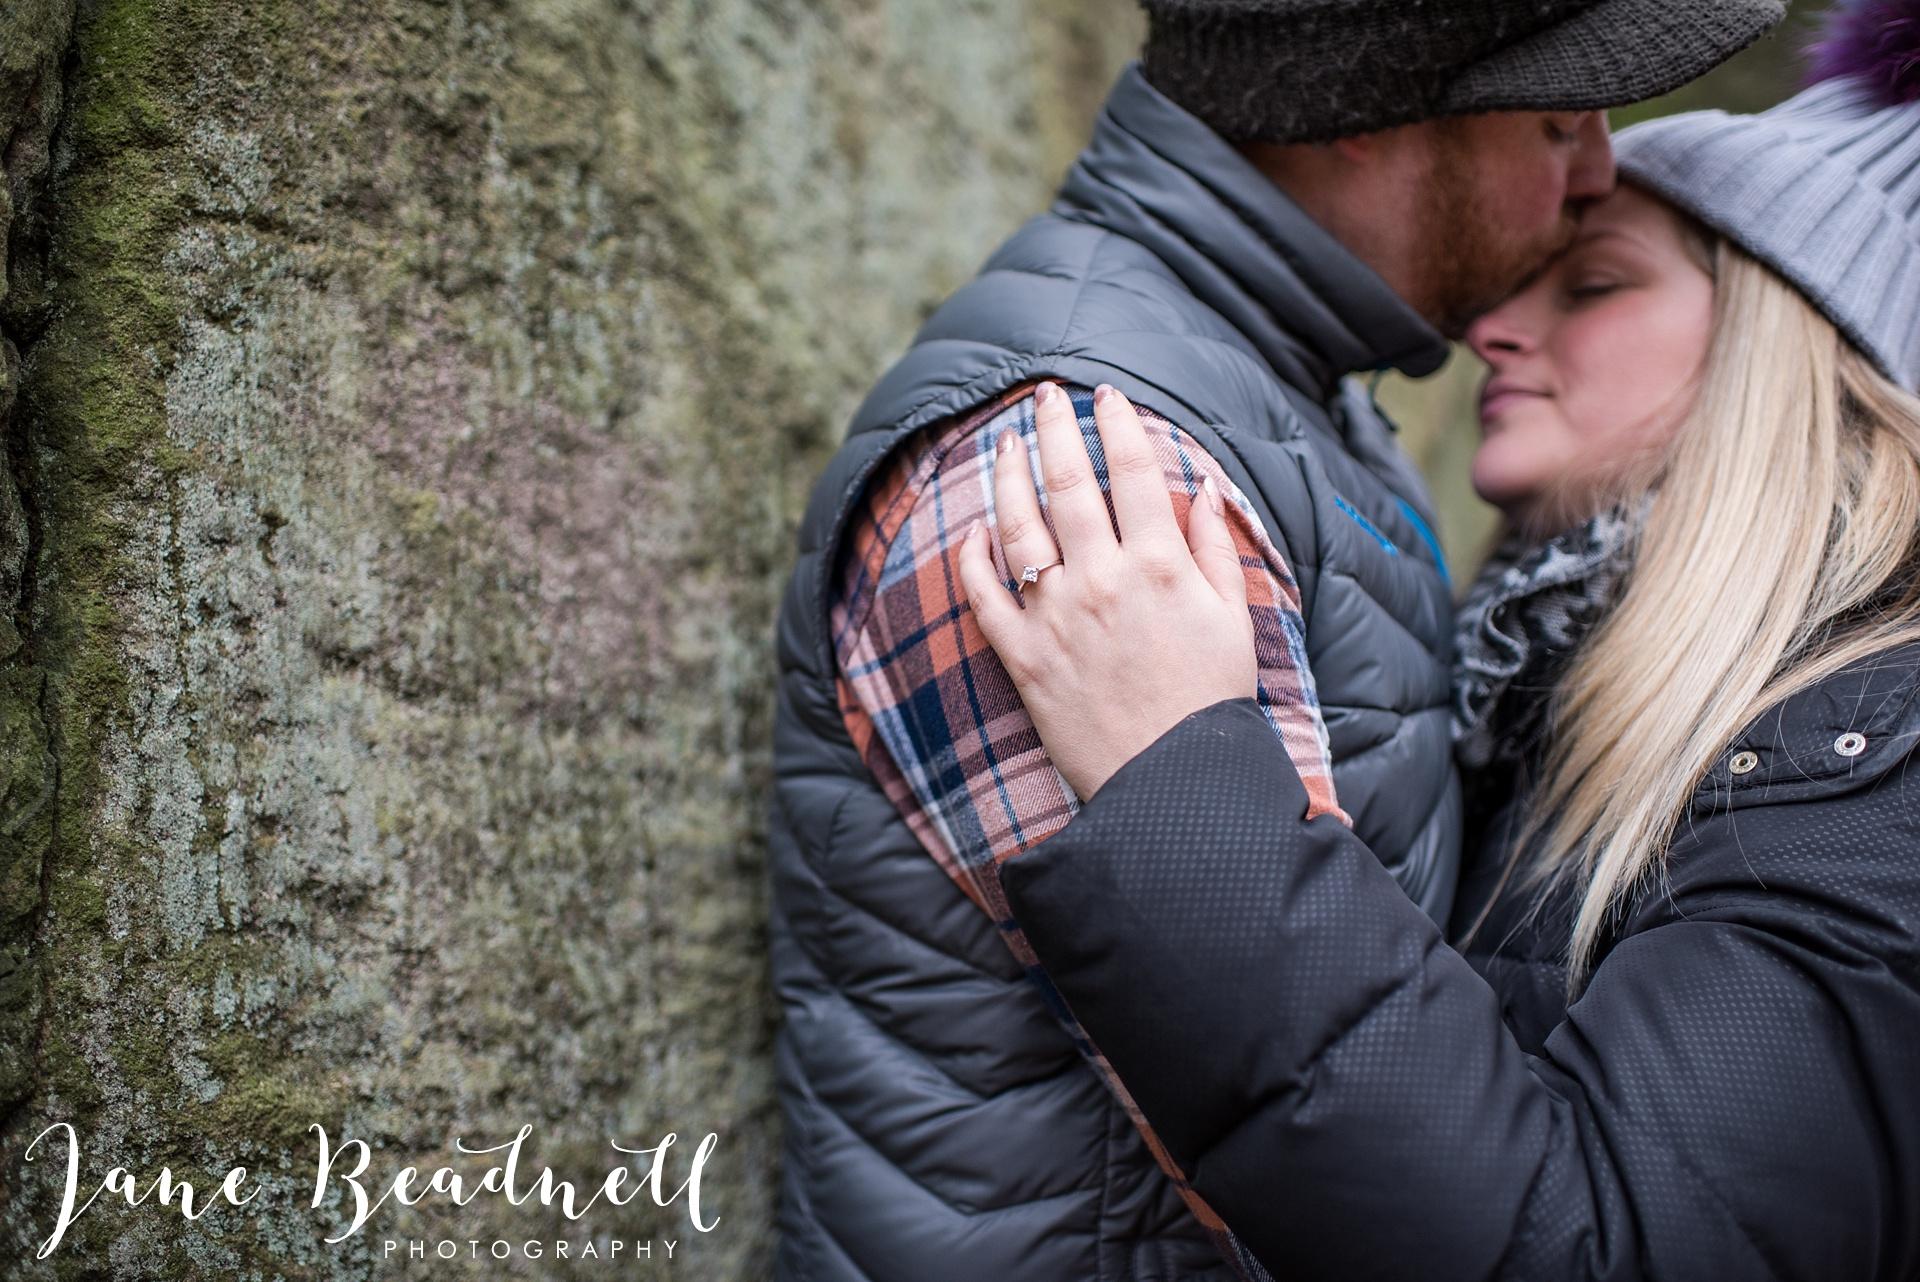 yorkshire-wedding-photographer-jane-beadnell-photography-uk-and-destination-wedding-photographer-engagement-shoot_0053